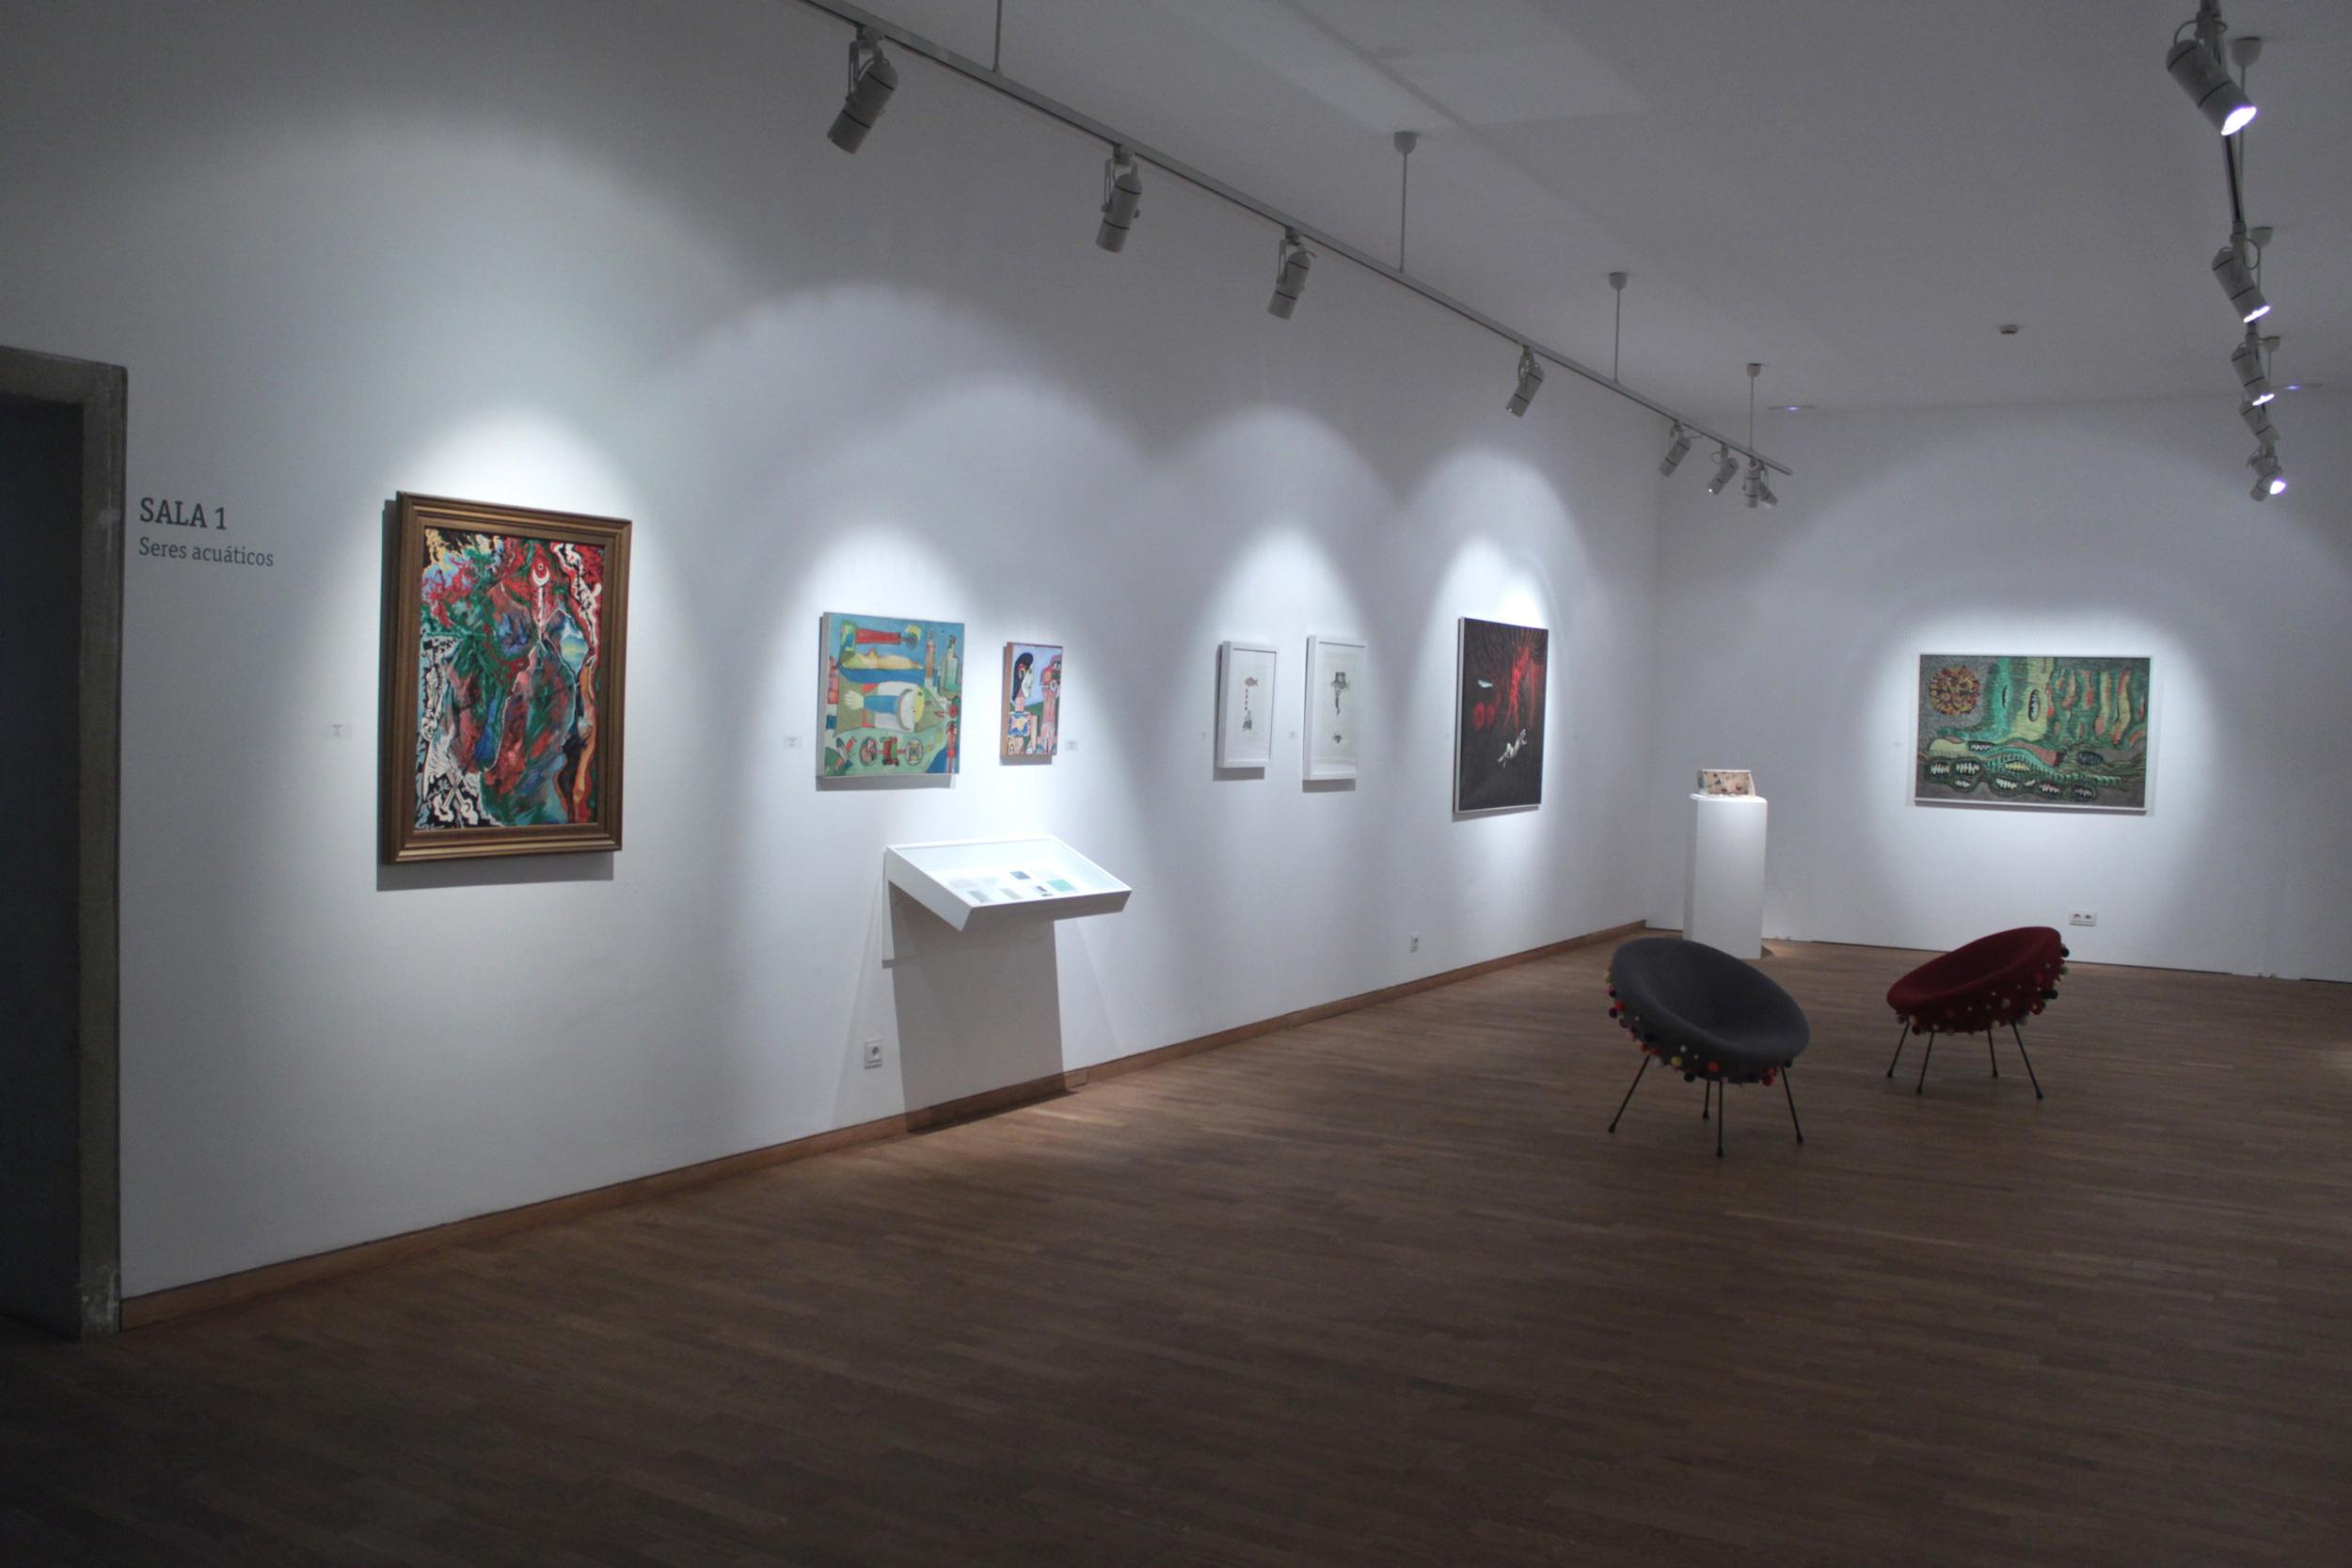 Exhibition hall 1, 3rd floor